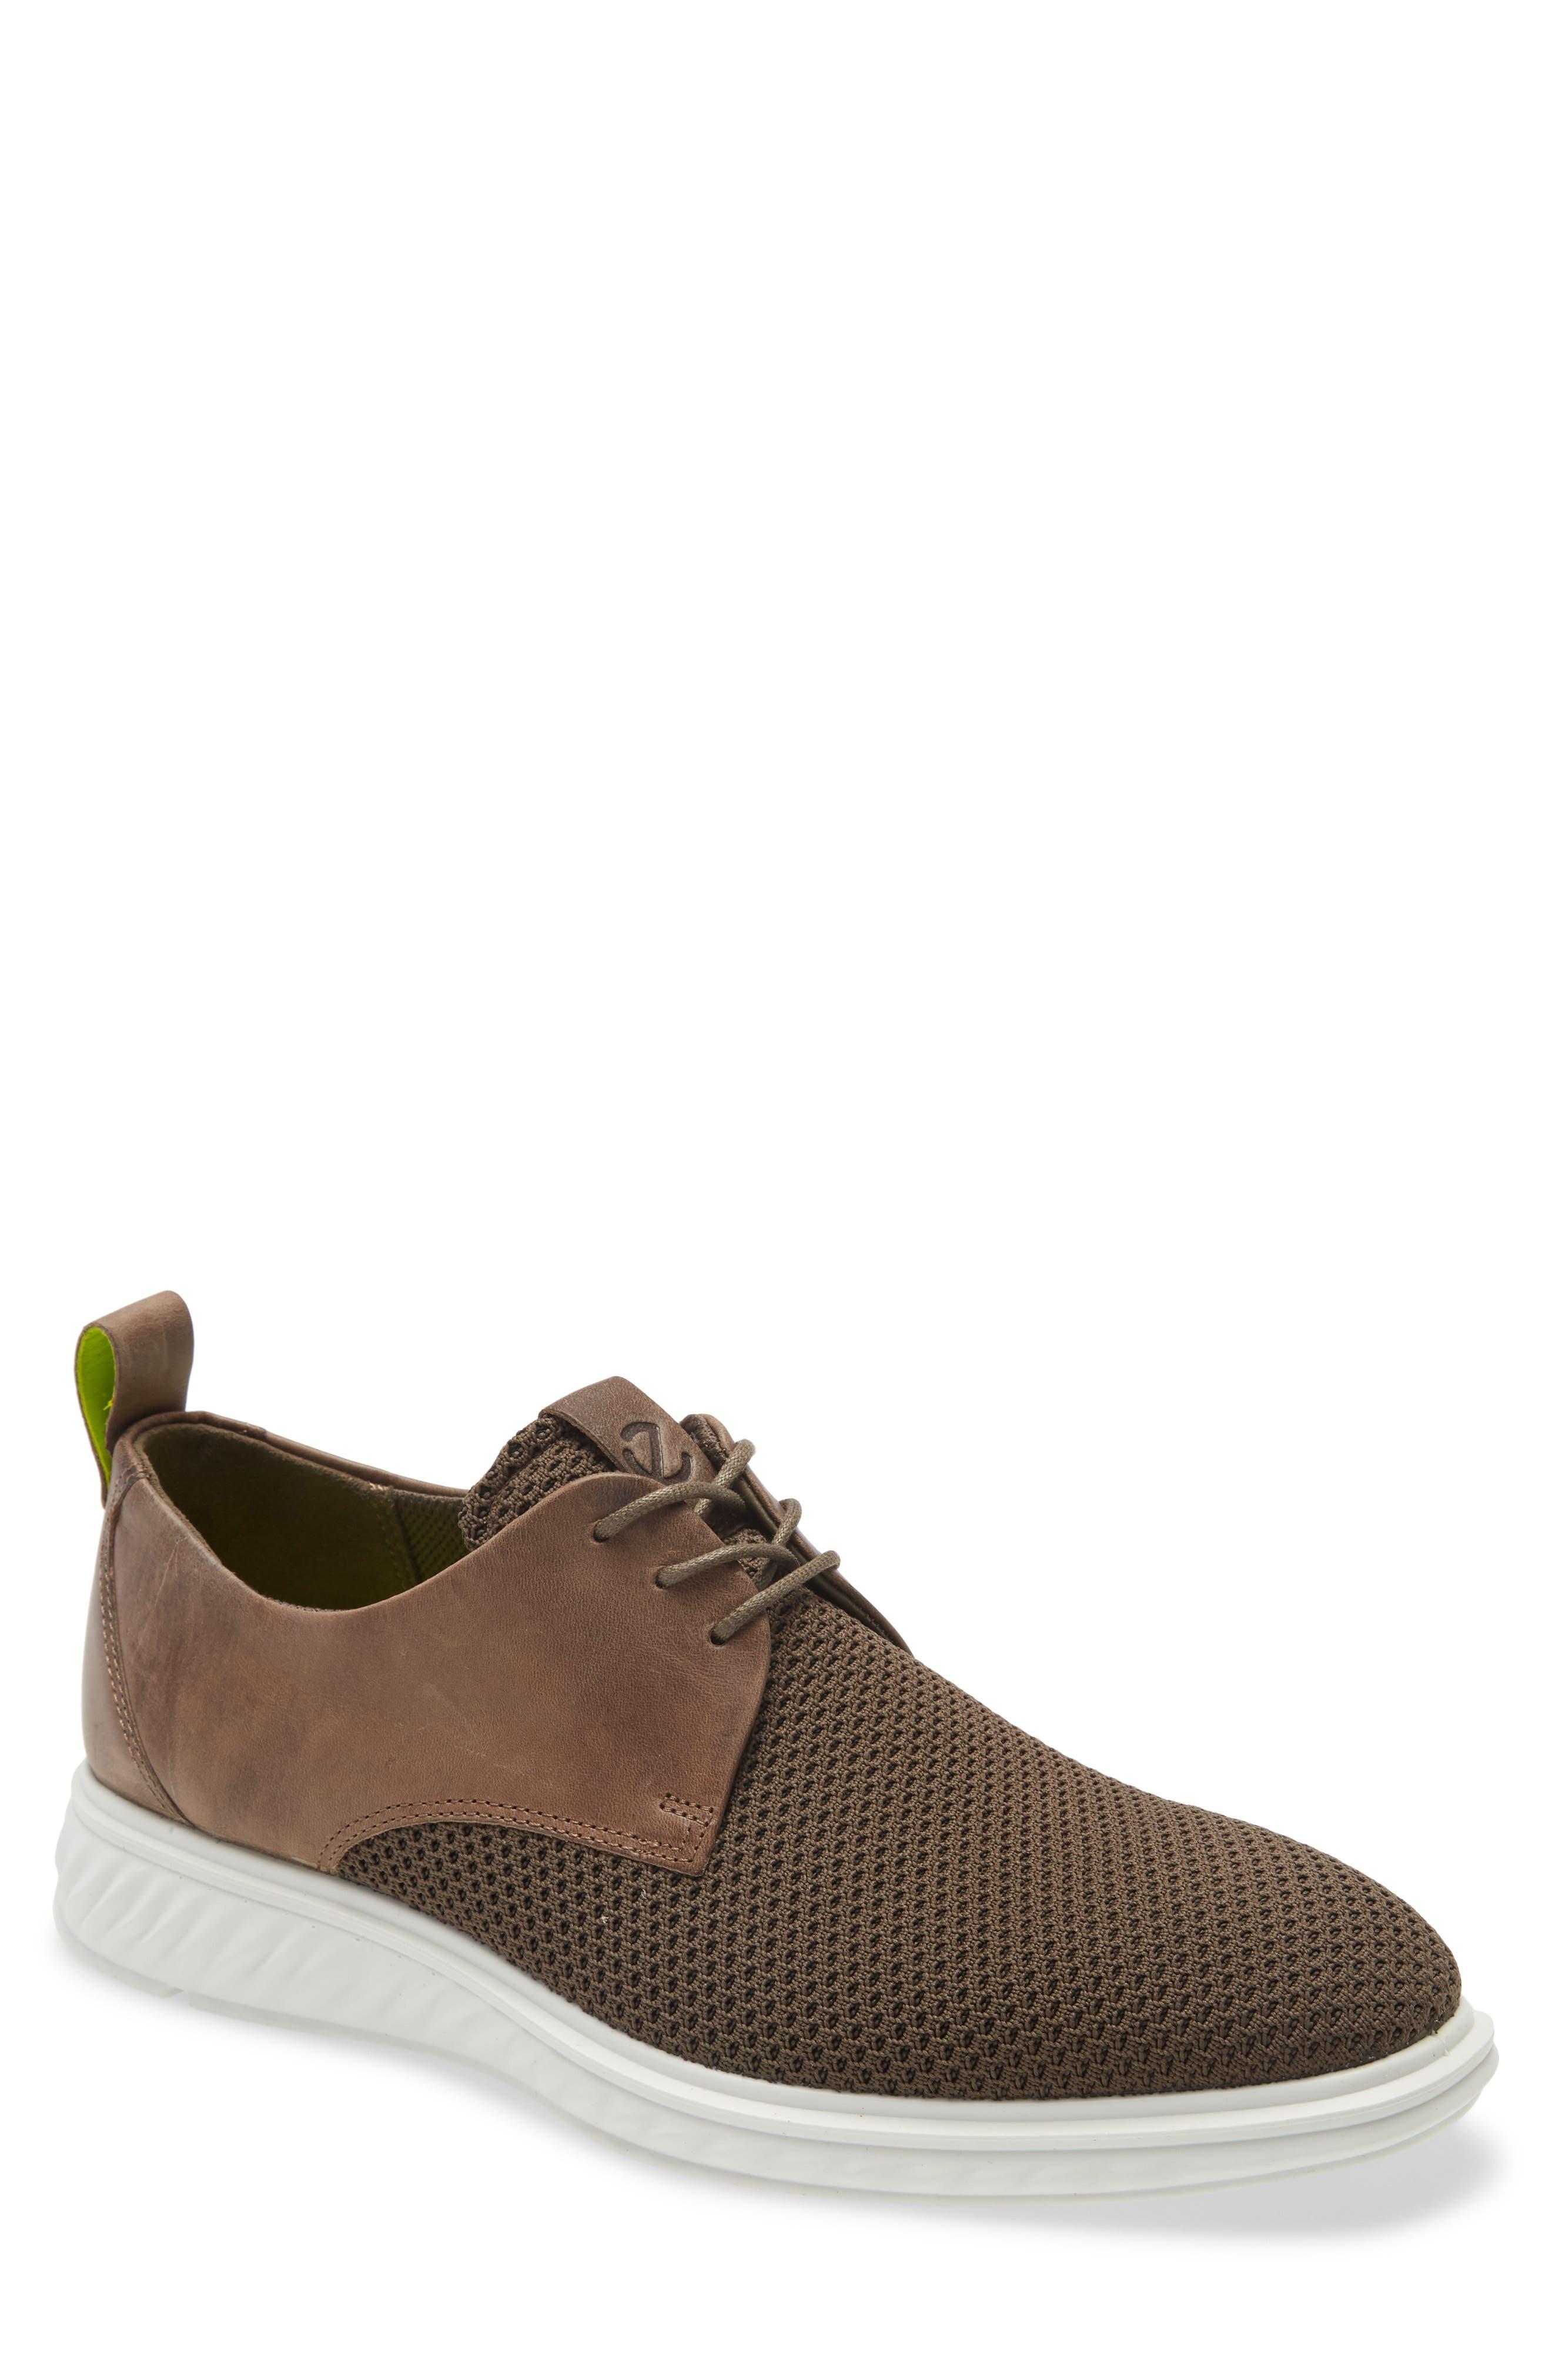 Image of ECCO ST.1 Hybrid Lite Casual Sneaker